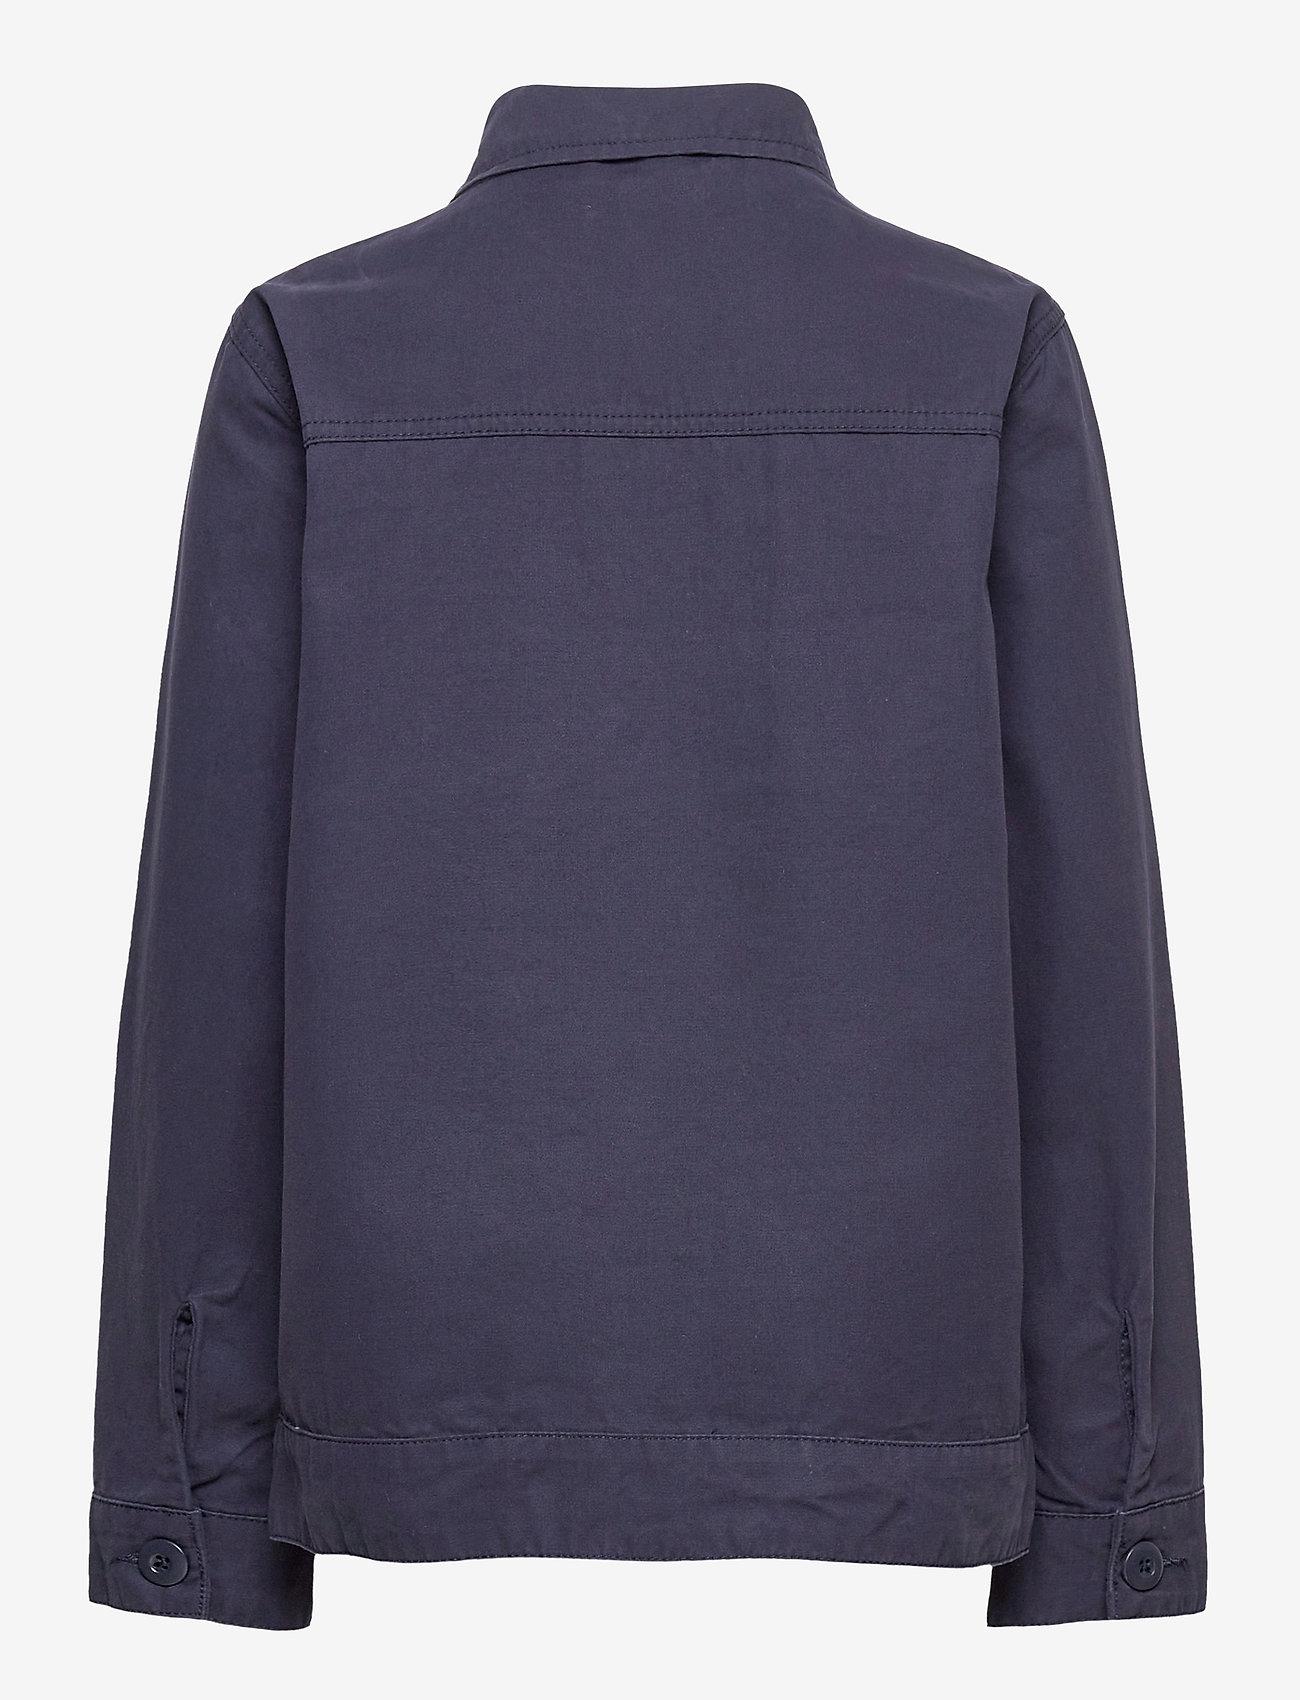 Costbart - KALEB L_S OVERSHIRT - shirts - 19-4014 ombre blue - 1